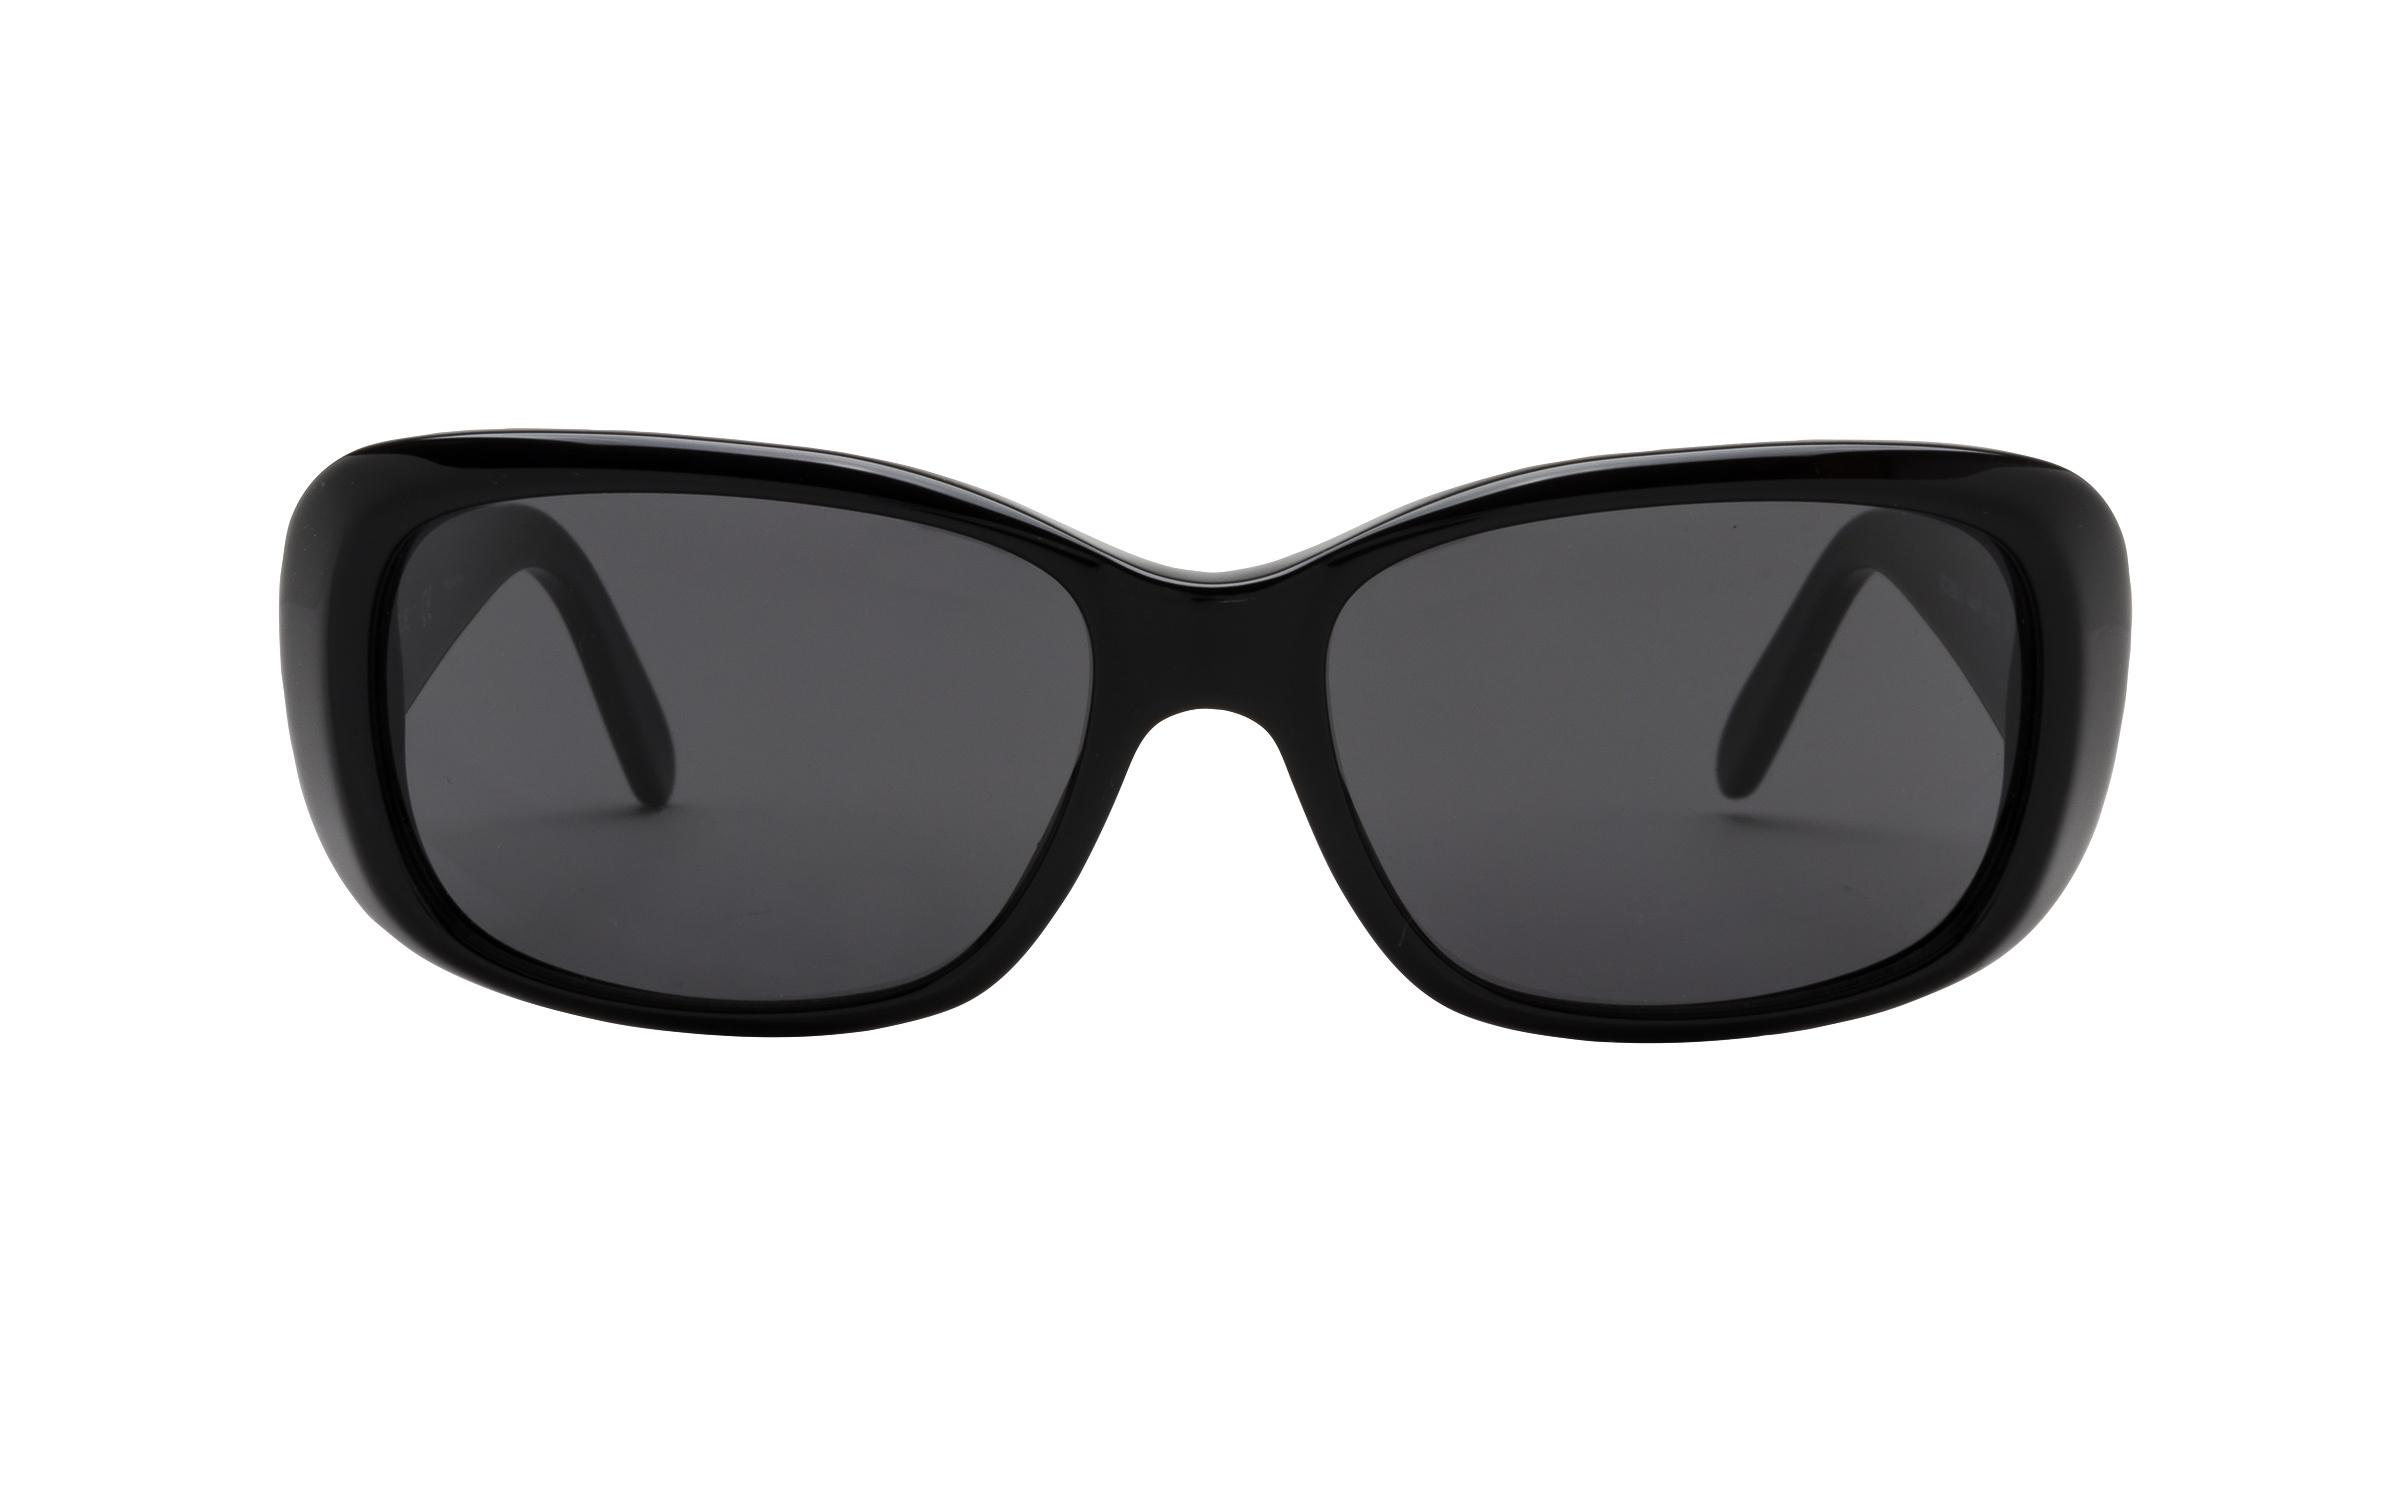 http://www.coastal.com/ - Luxottica Vogue VO2606-S W44/87 55 Sunglasses in Black – Online Coastal